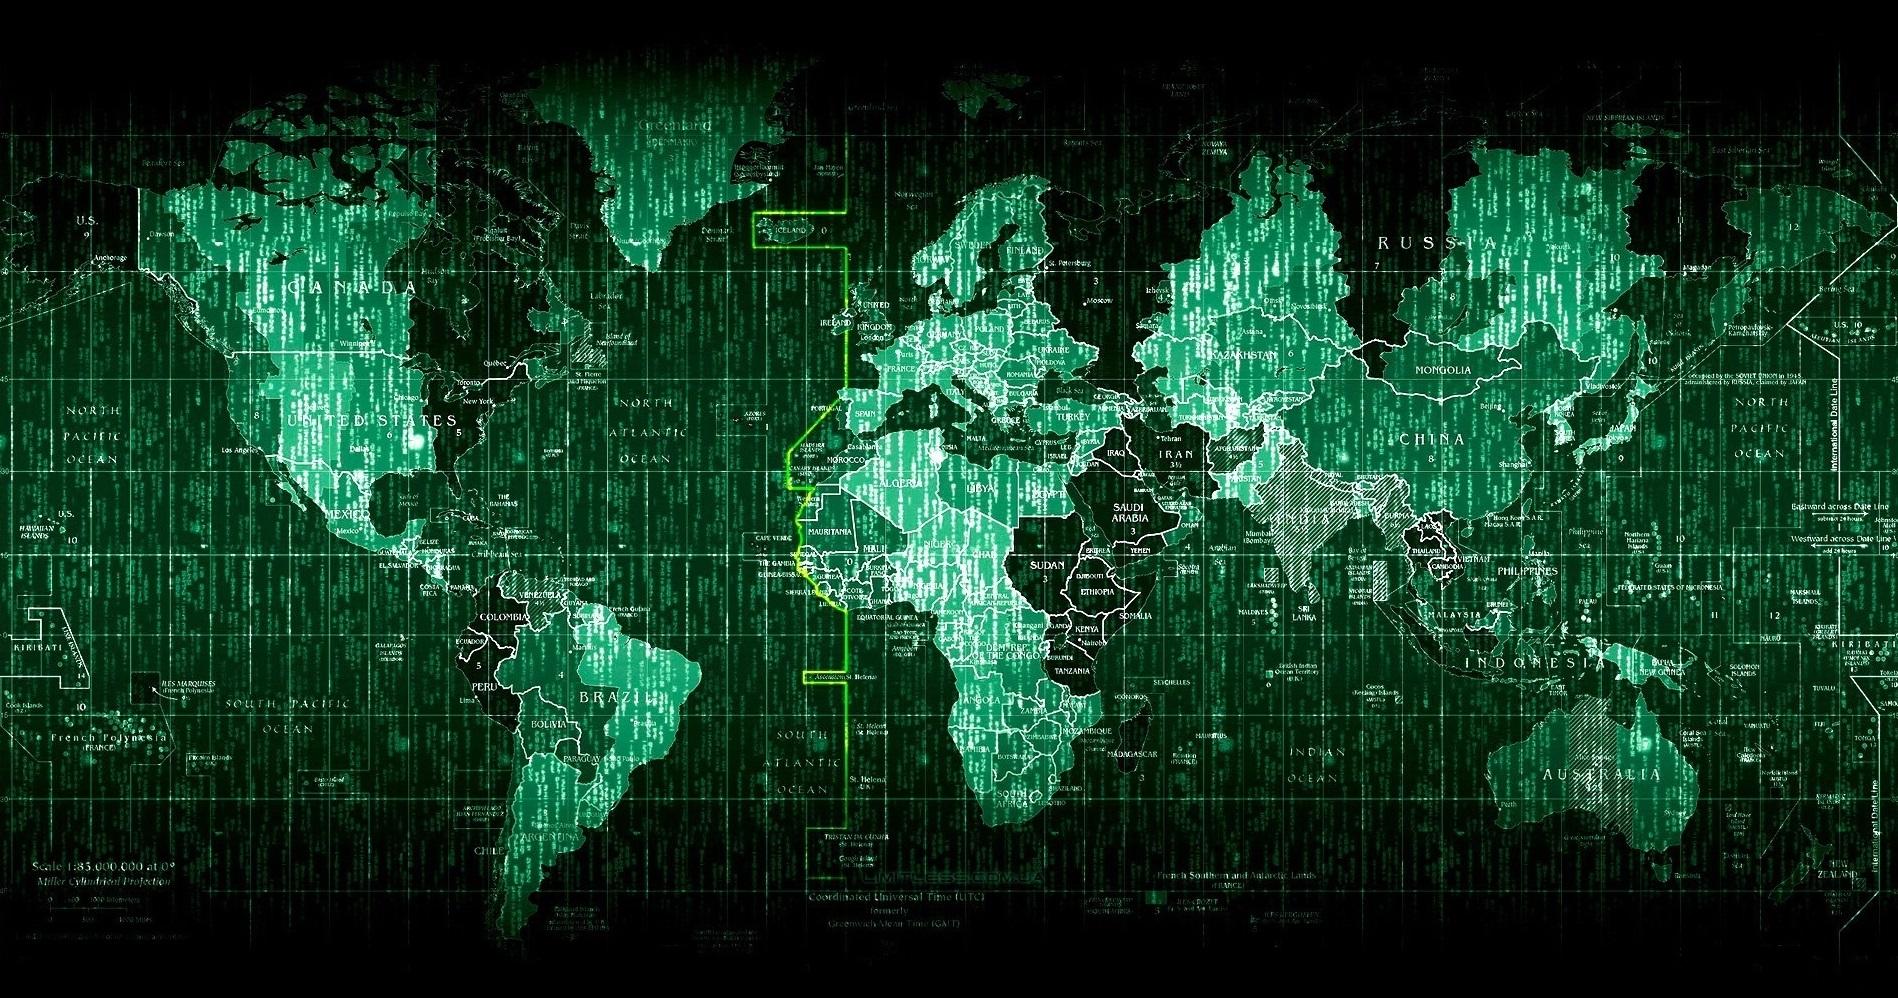 DND NEWS GLOBAL SECURITY